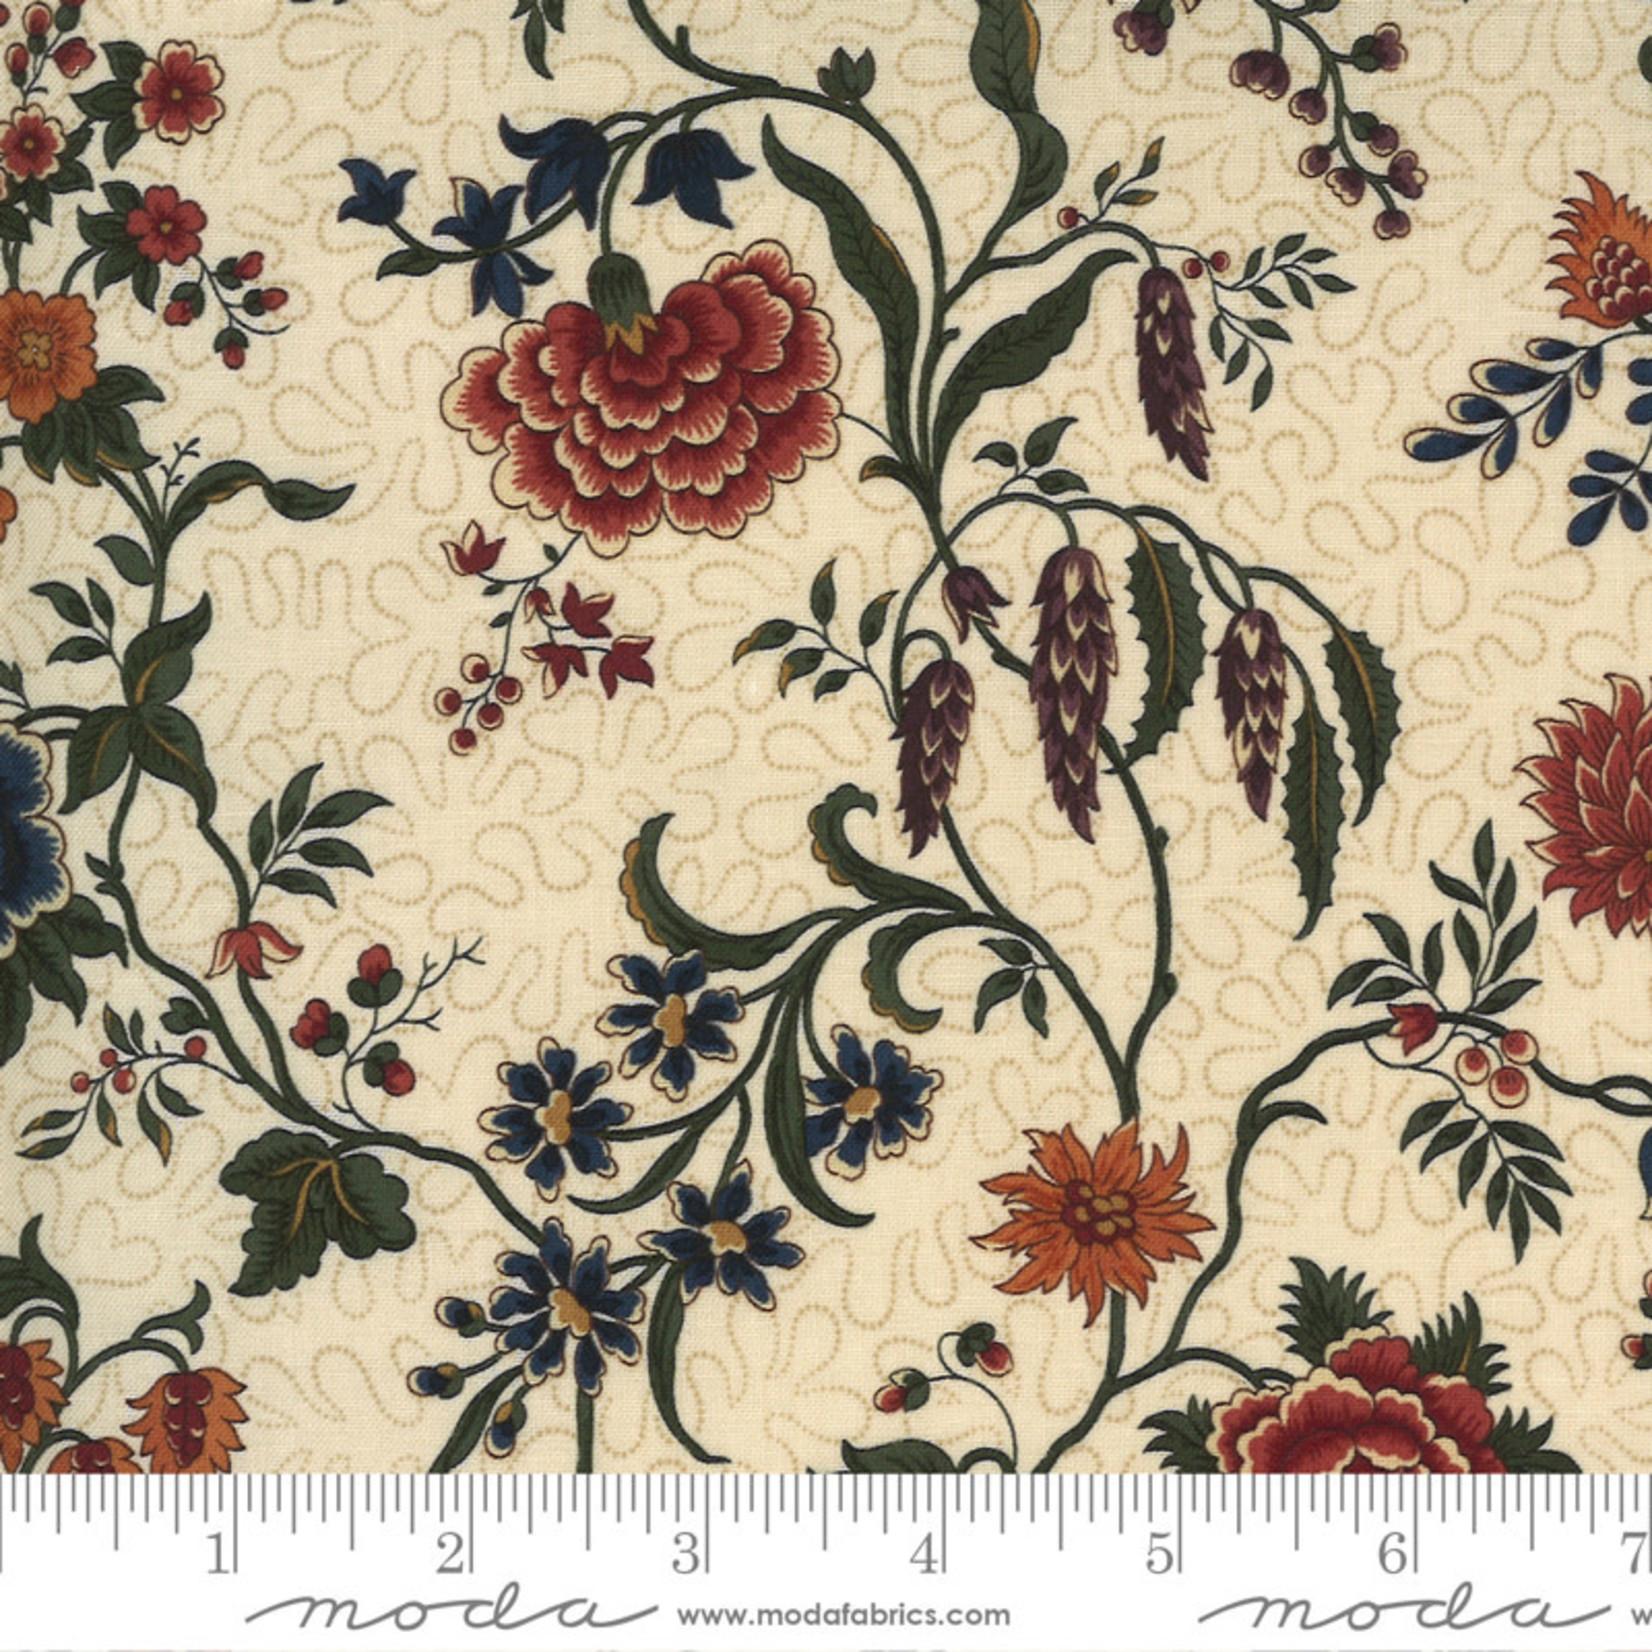 Kansas Troubles Quilters Prairie Dreams, Prairie Flowers Florals, Tan 9650 11 $0.20 per cm or $20/m